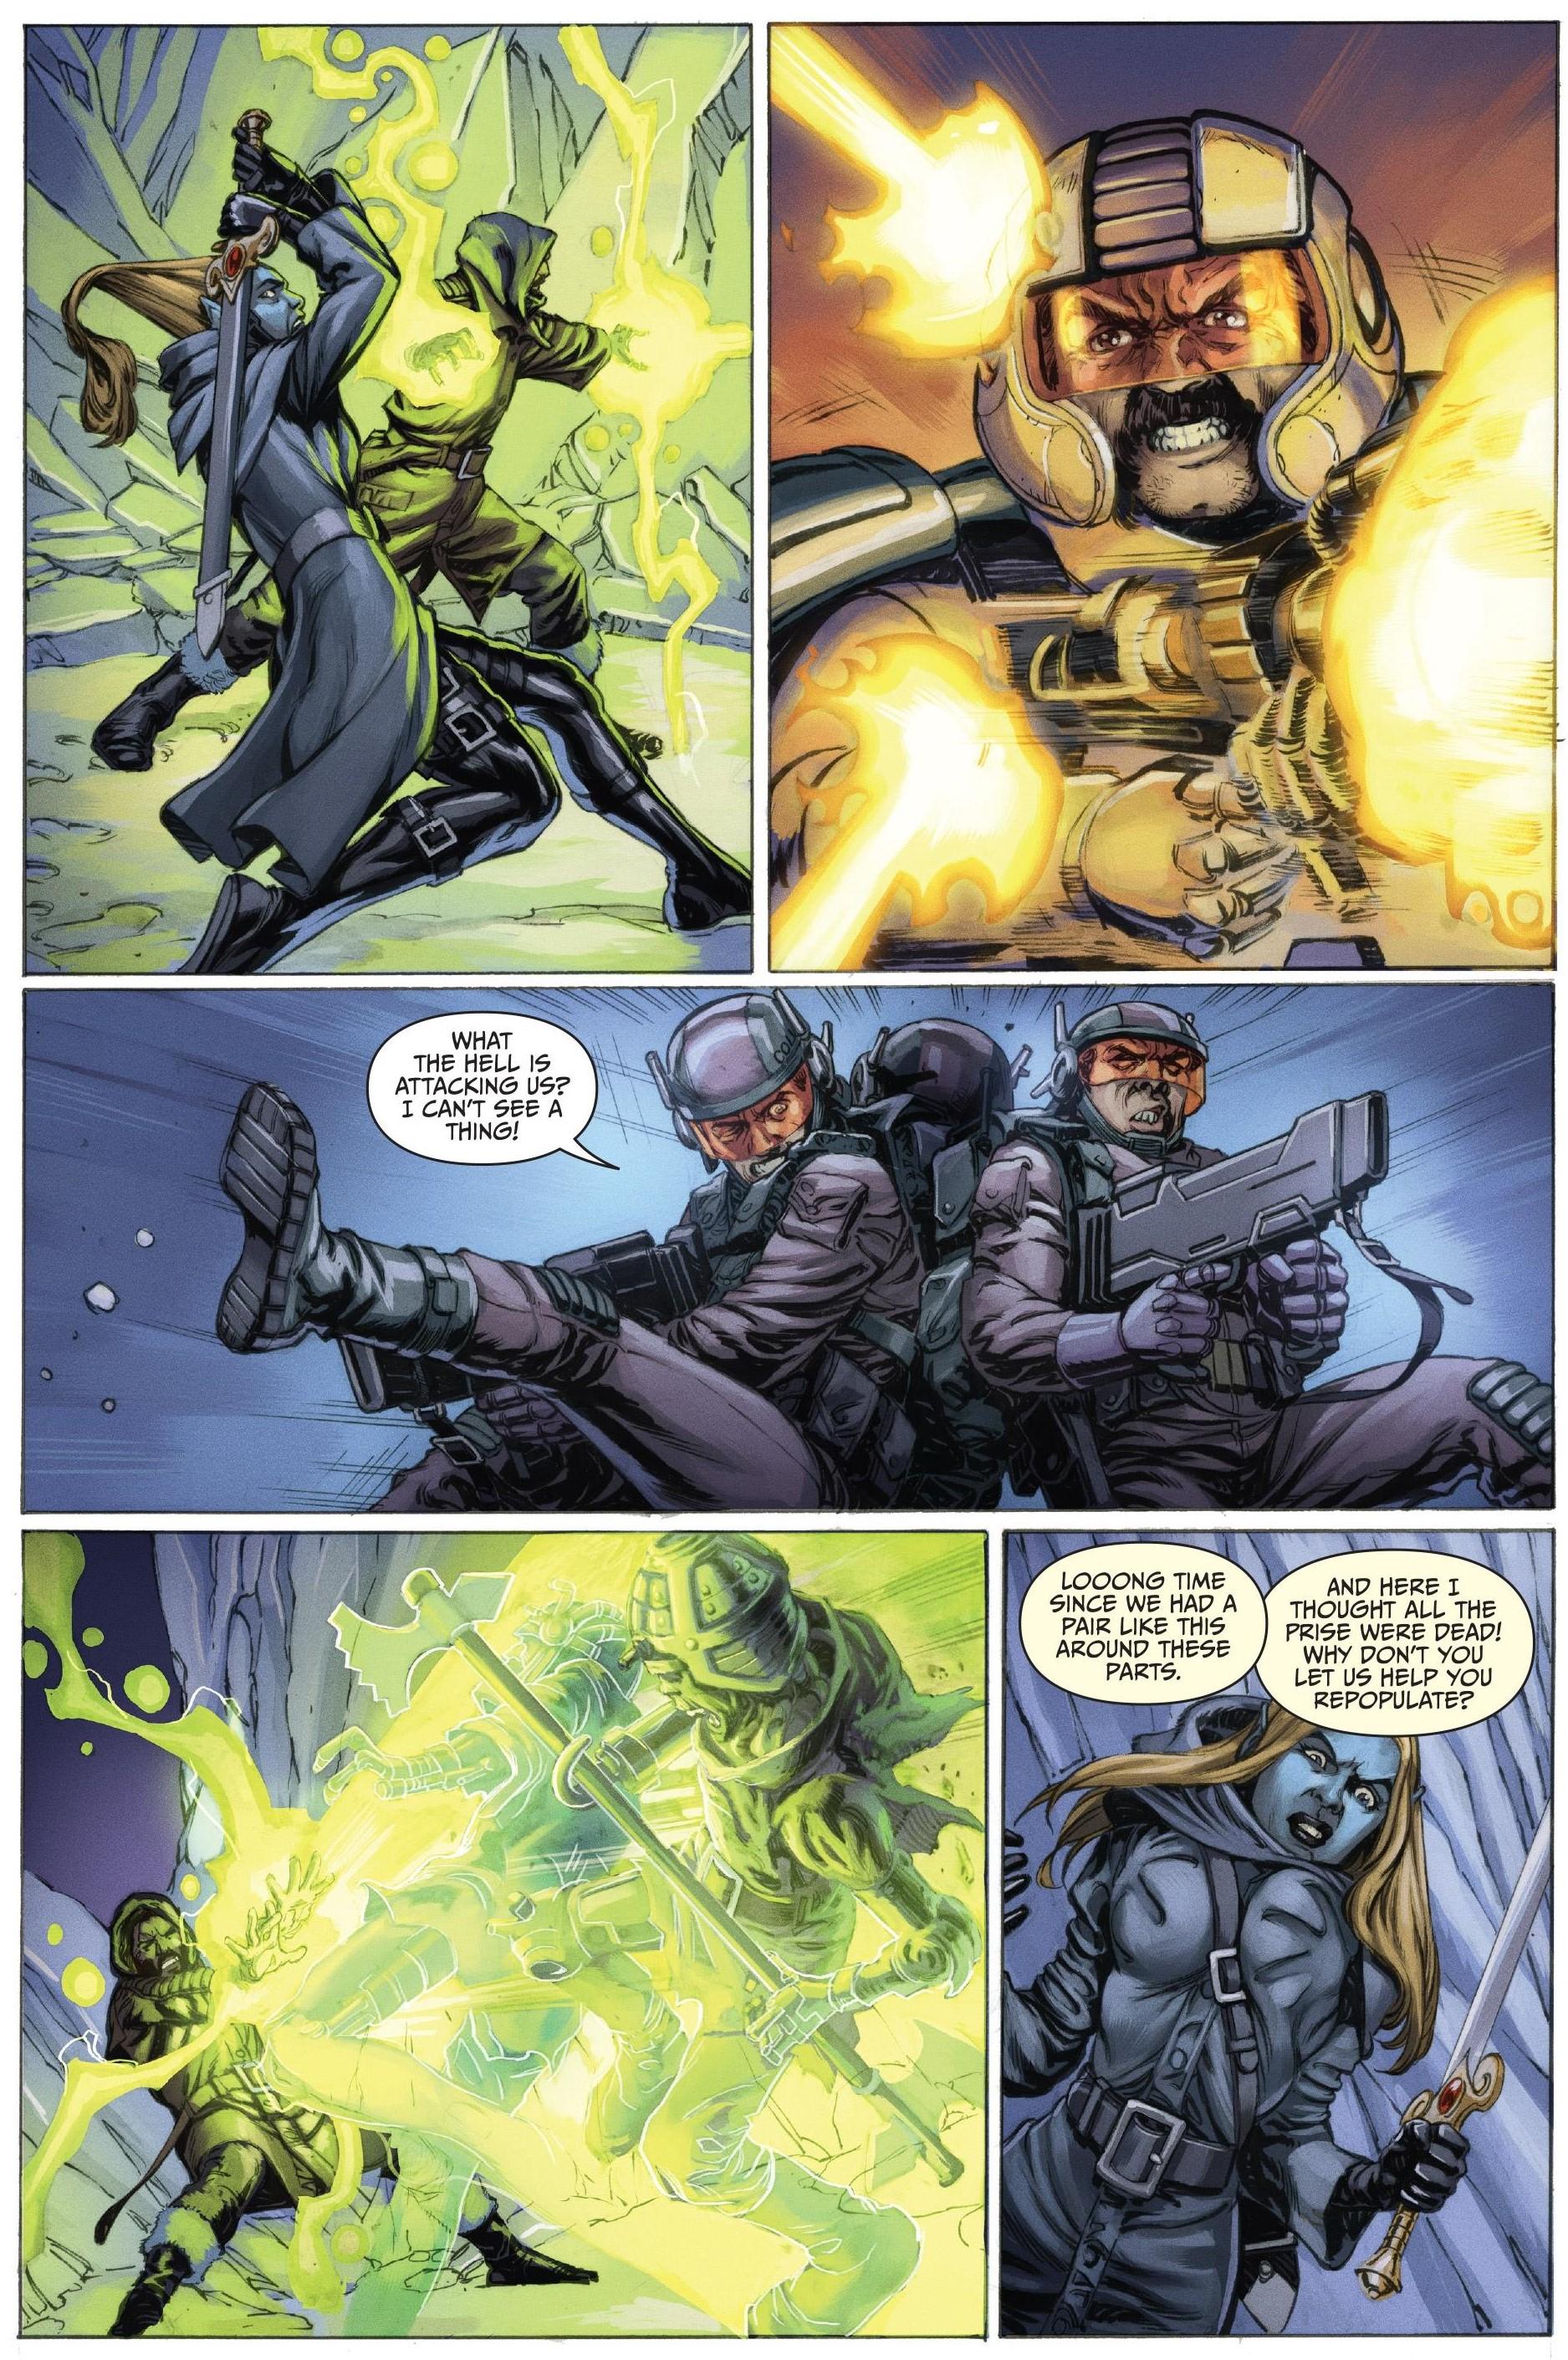 1: Doom Marine Jesse 2: Bad Invisible Groping